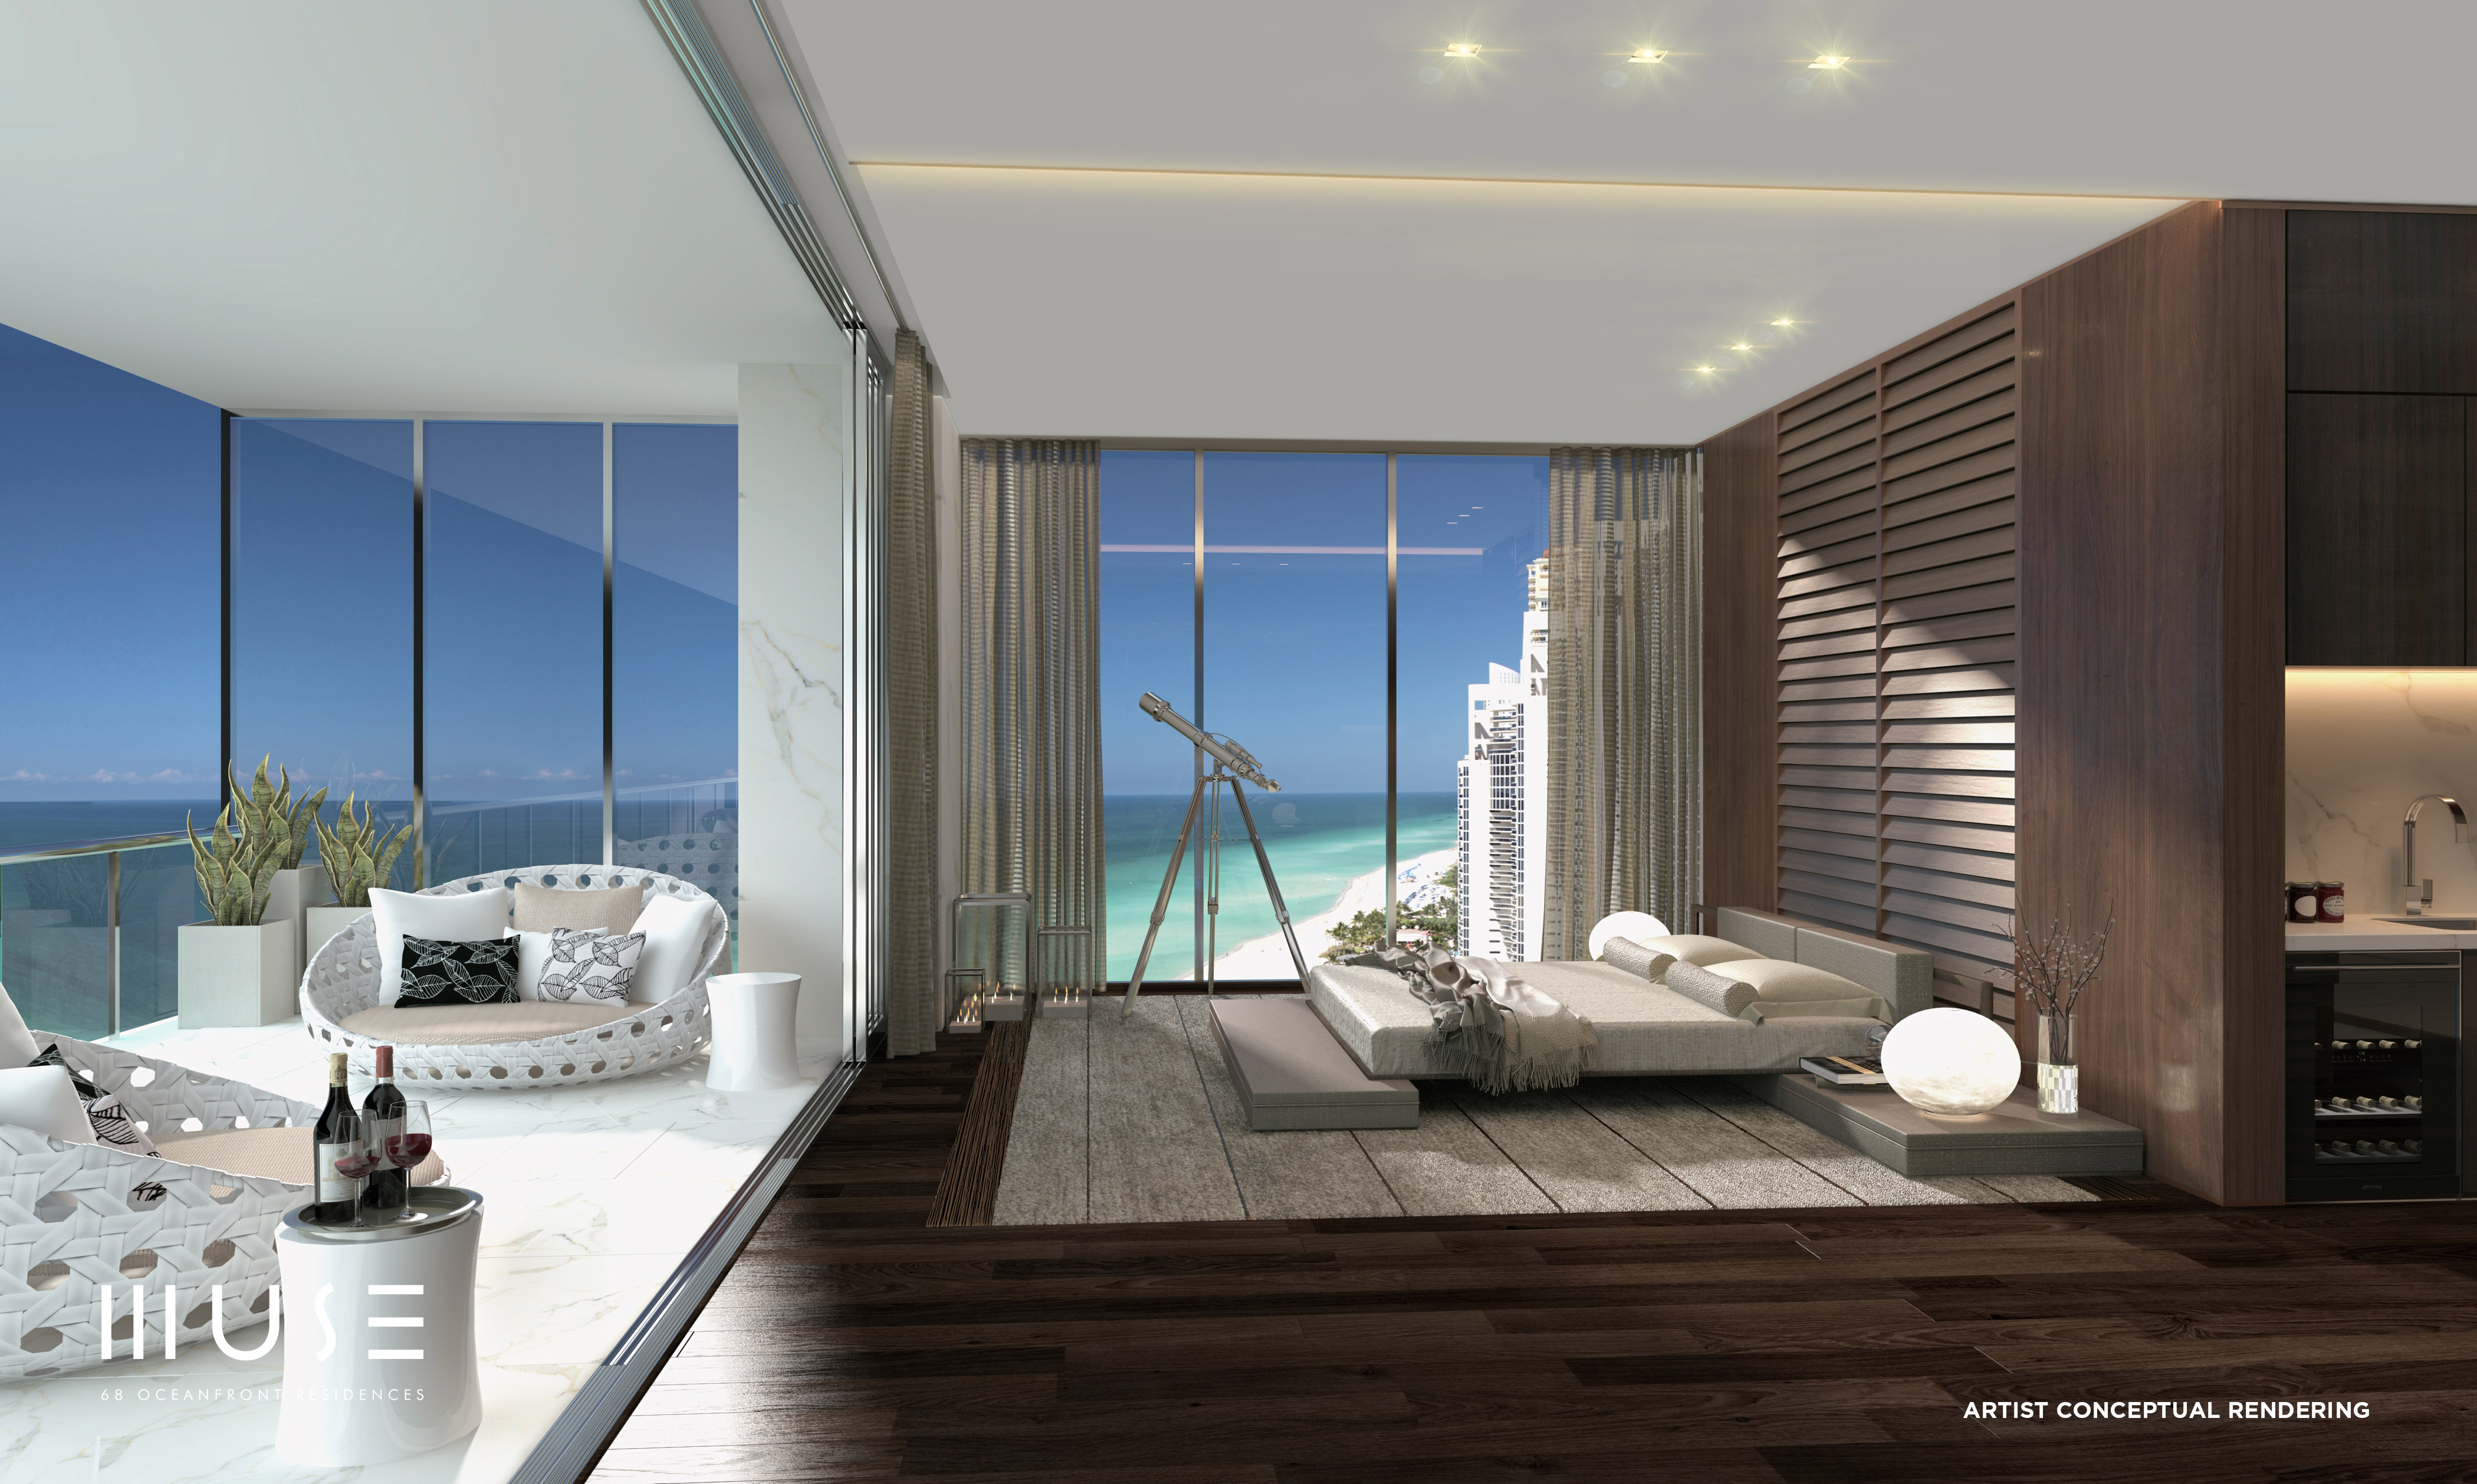 20 bedroom house.  Sunny Isles Beach Miami Curbed